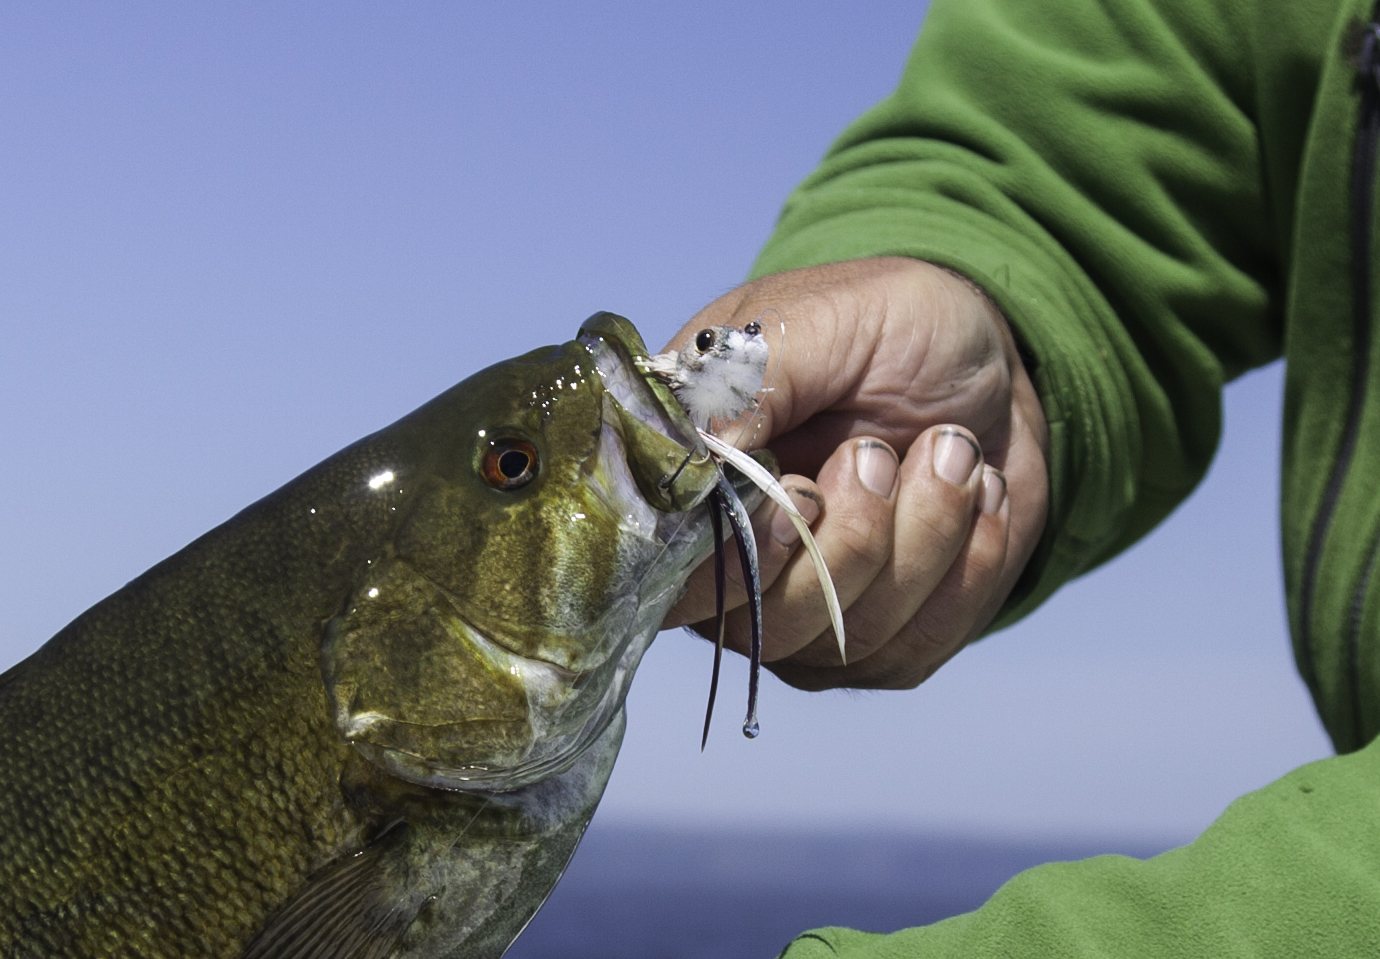 A Dave Whitlock Swimming Baitfish got this guy